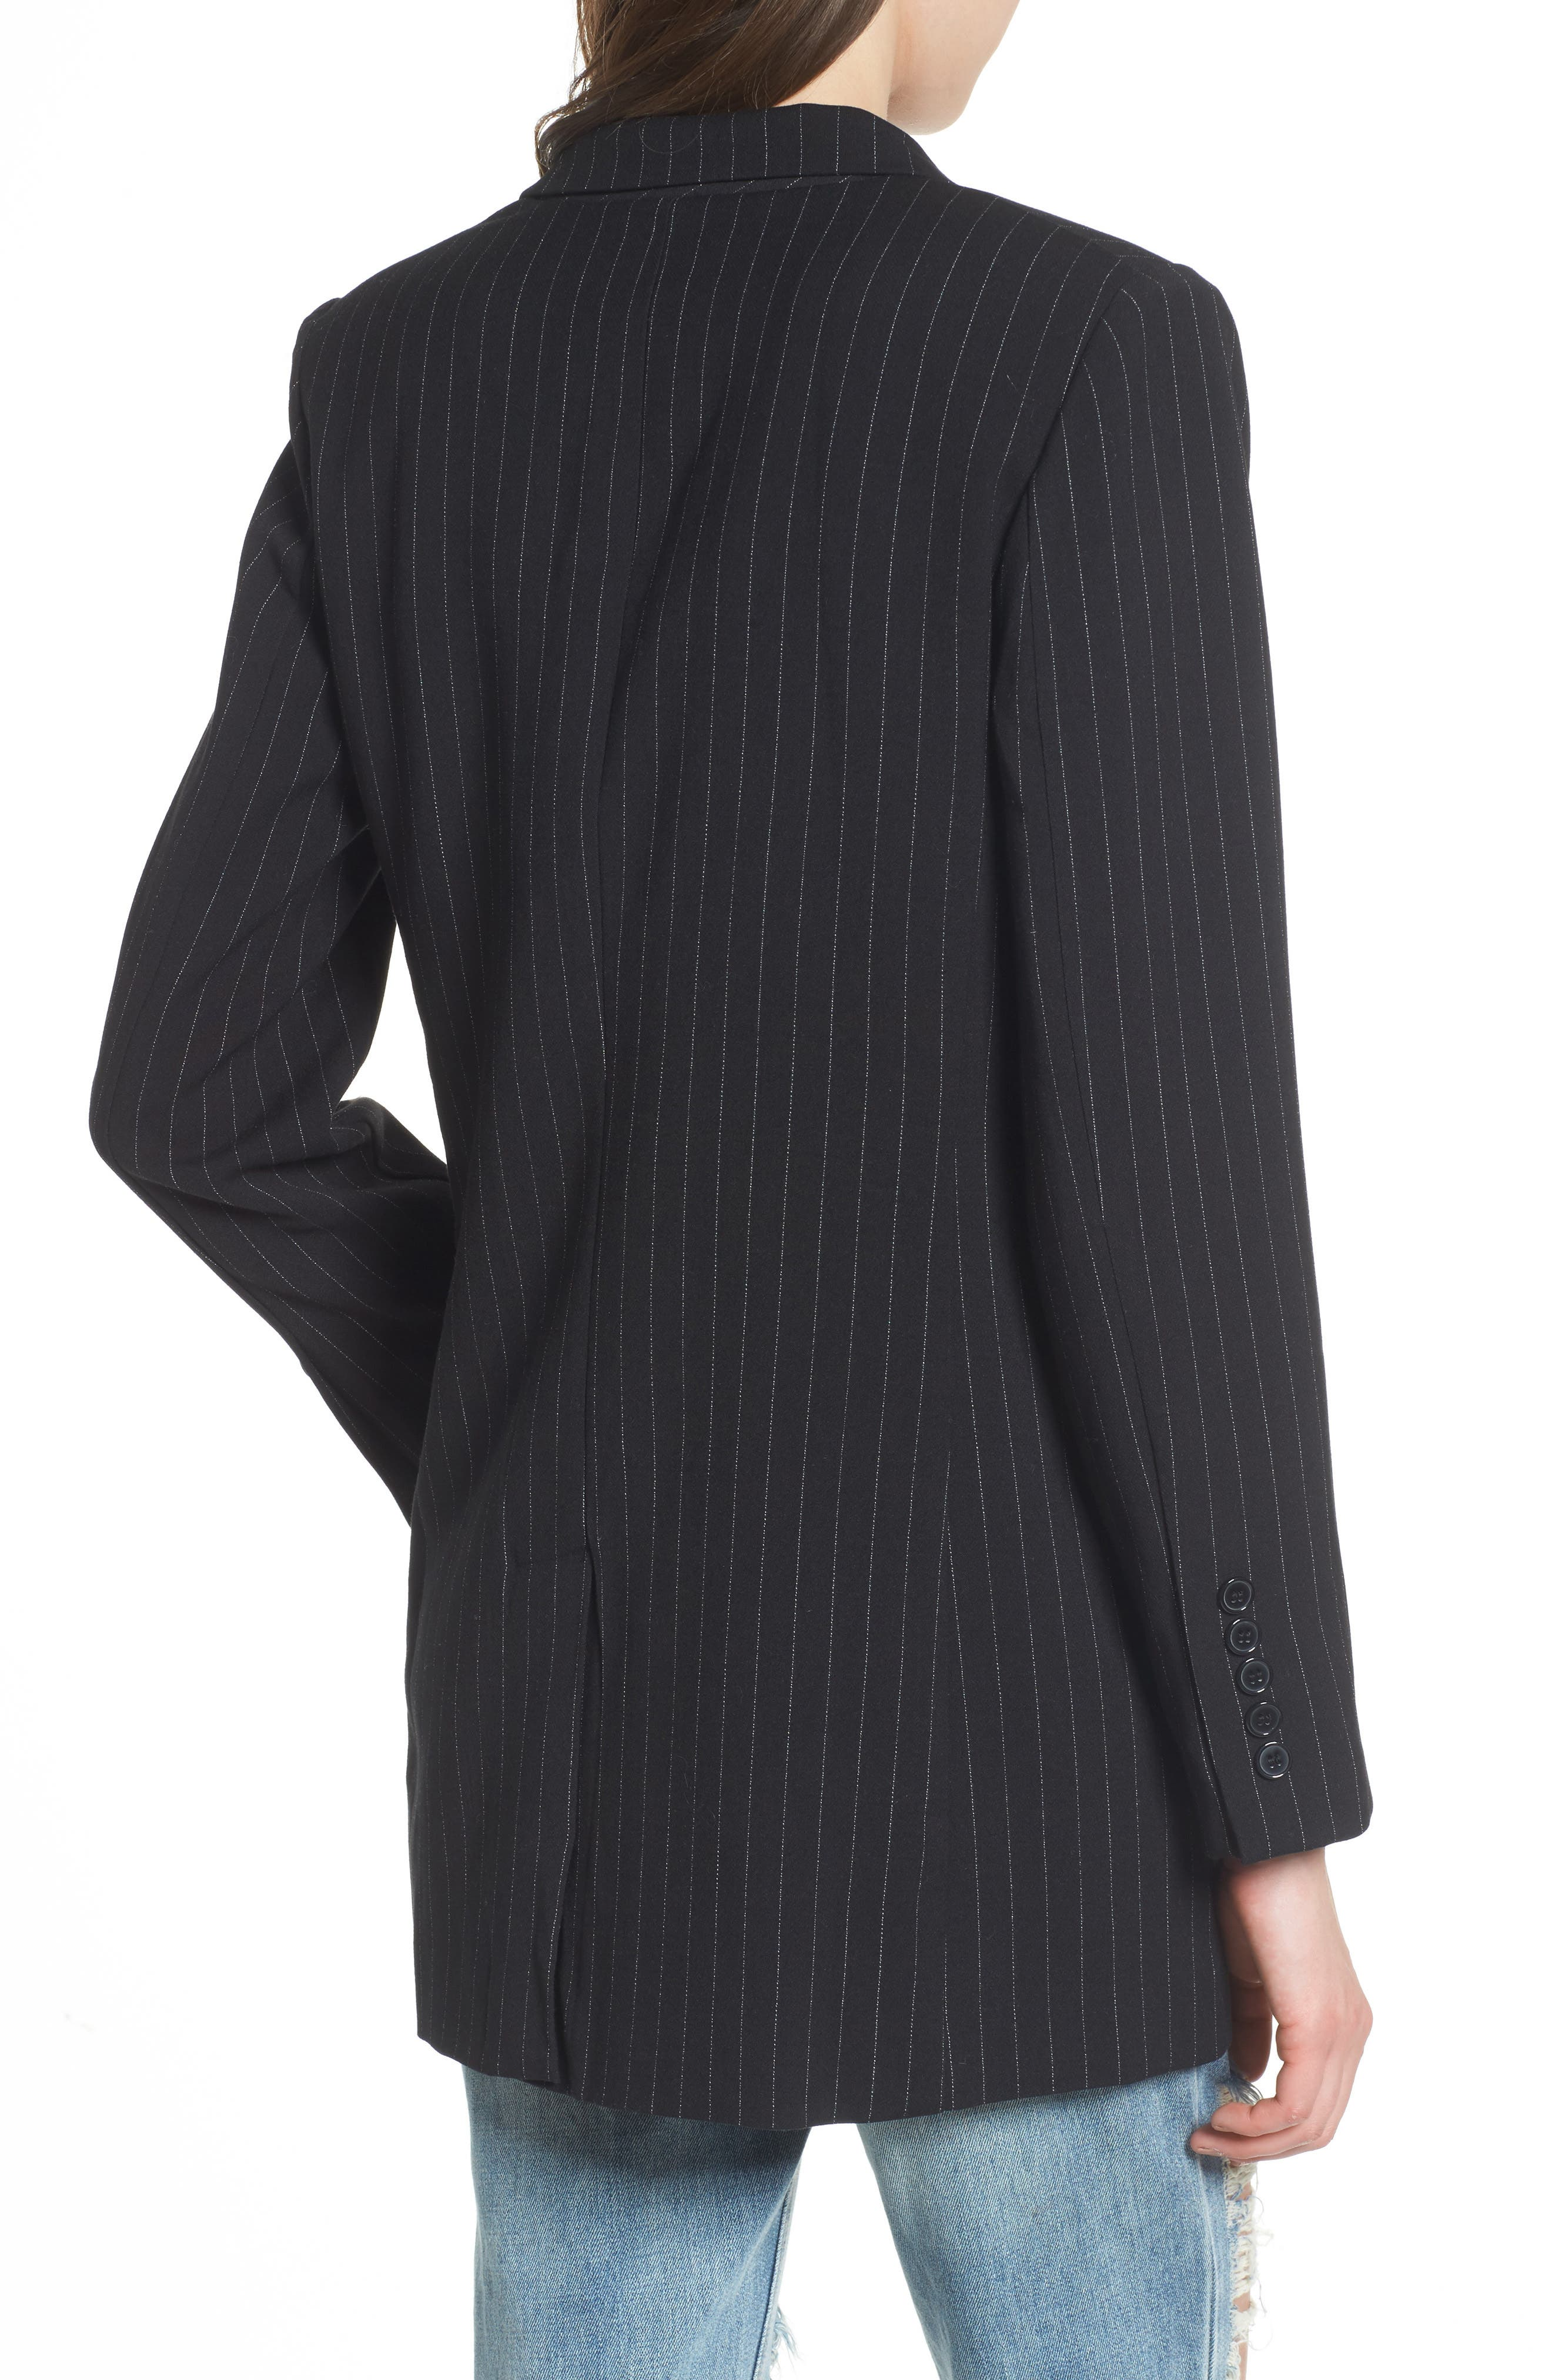 Nova Oversize Blazer,                             Alternate thumbnail 2, color,                             Menswear Suiting